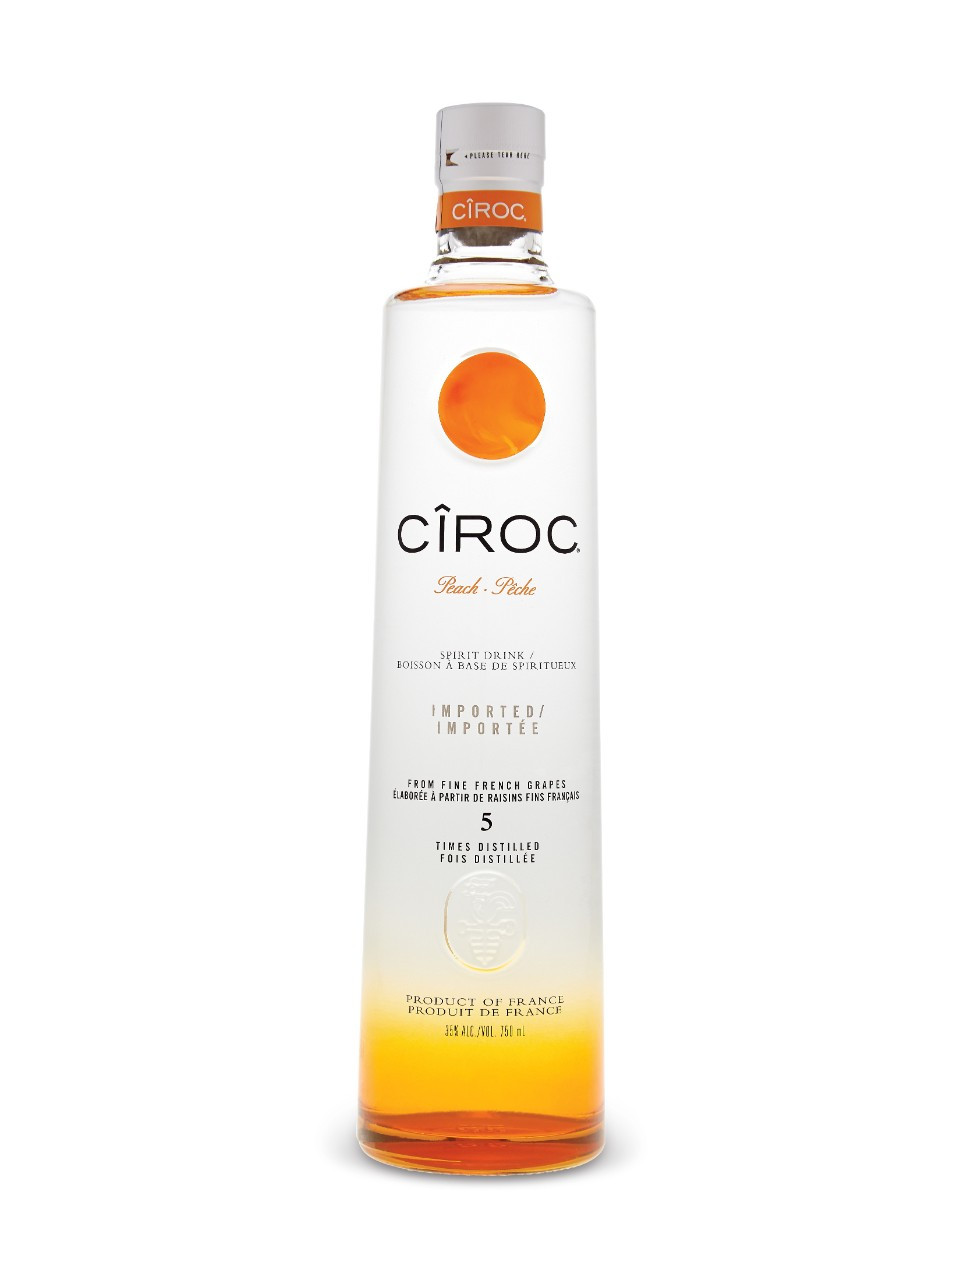 Peach Ciroc Drink Recipes  Ciroc Peach Spirit Drink